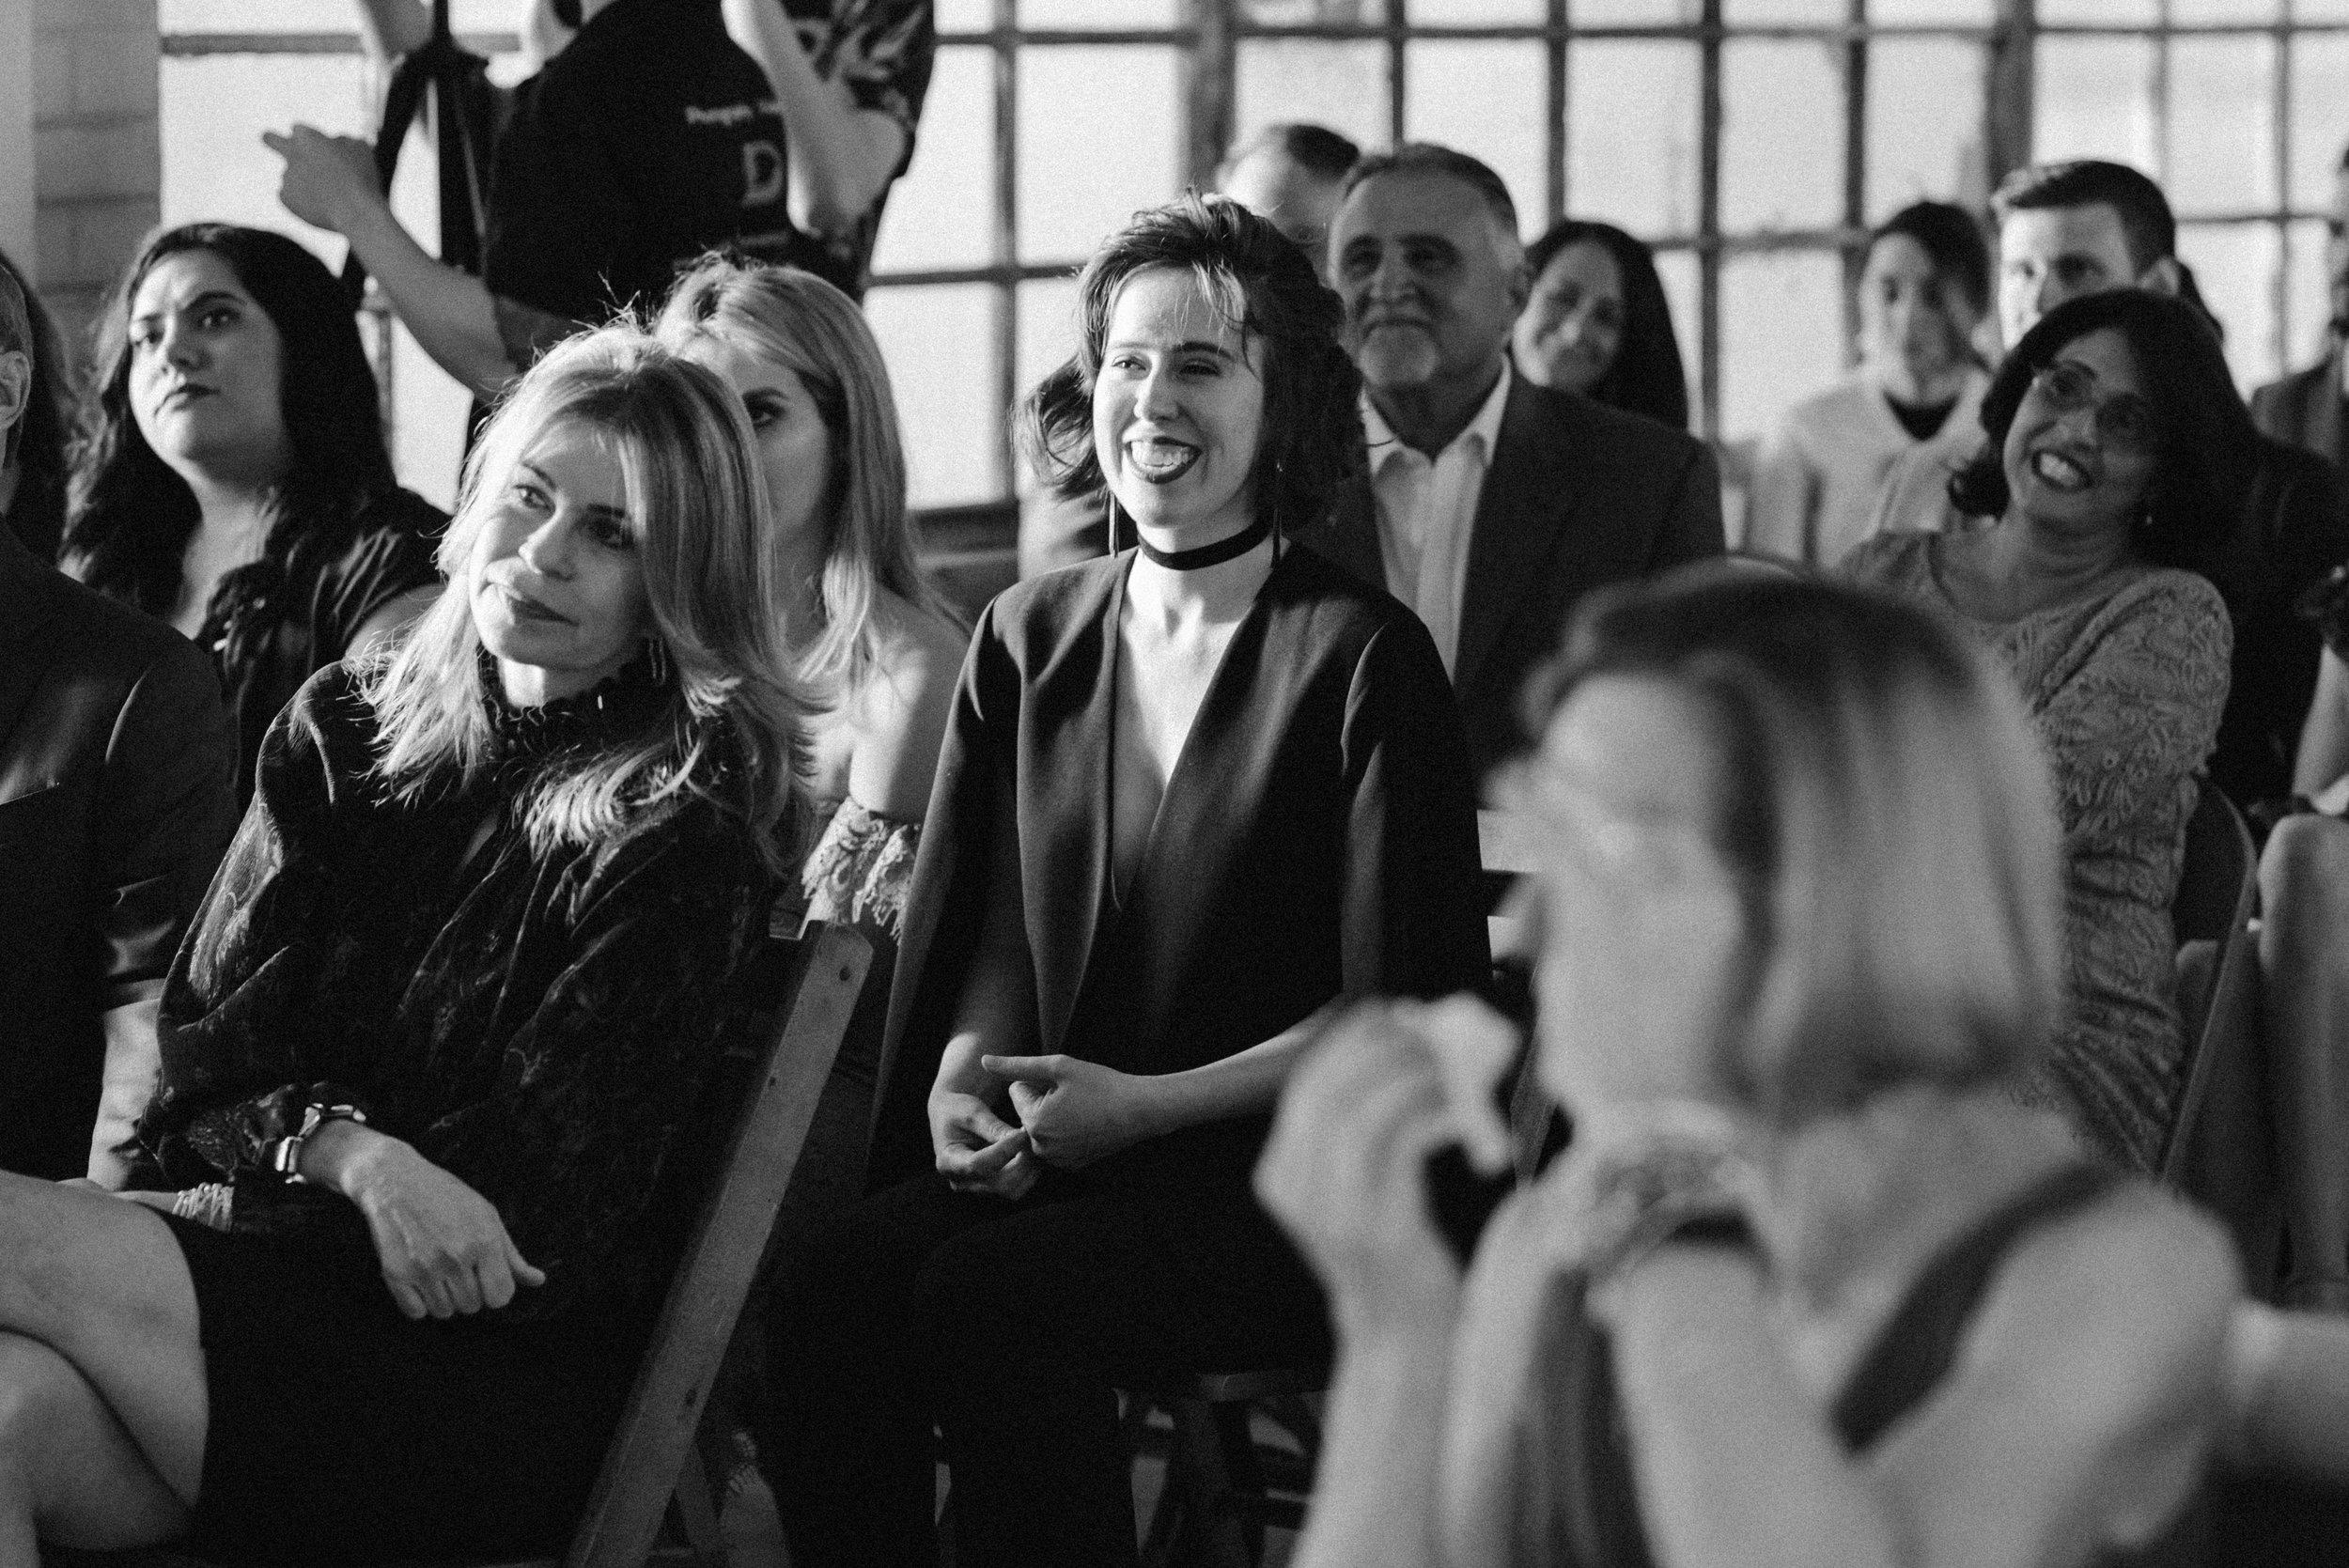 stephanie-bobby-ace-prop-house-miami-florida-wedding-790.jpg